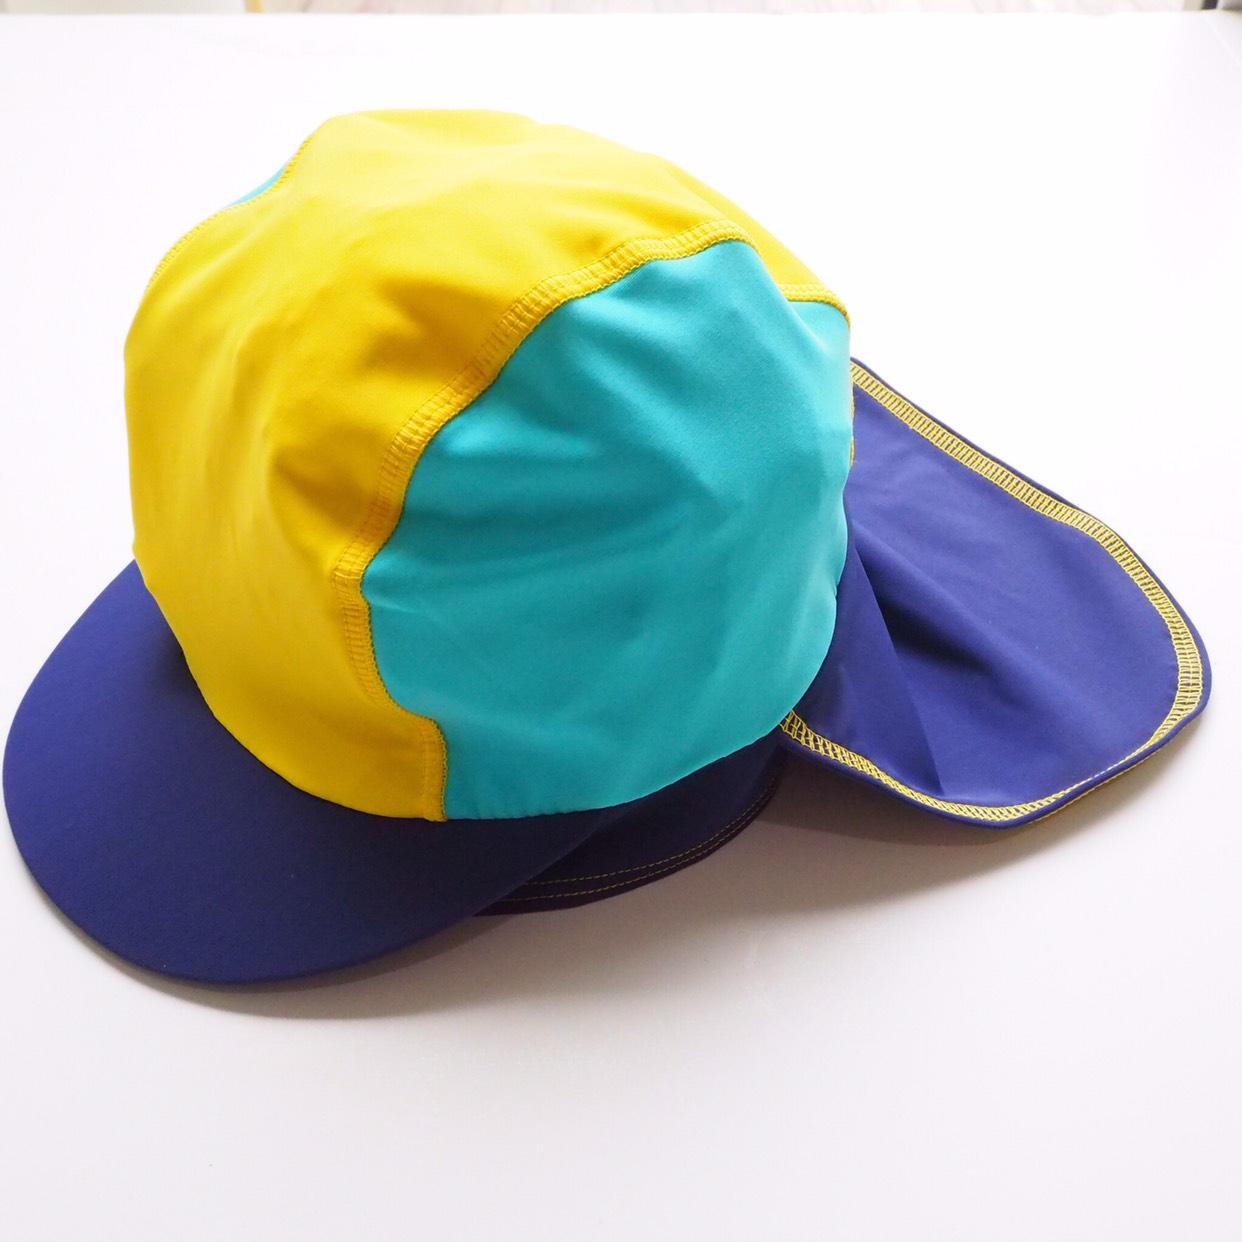 Beach Cap (Maiton)หมวกปิดต้นคอไม้ท่อน